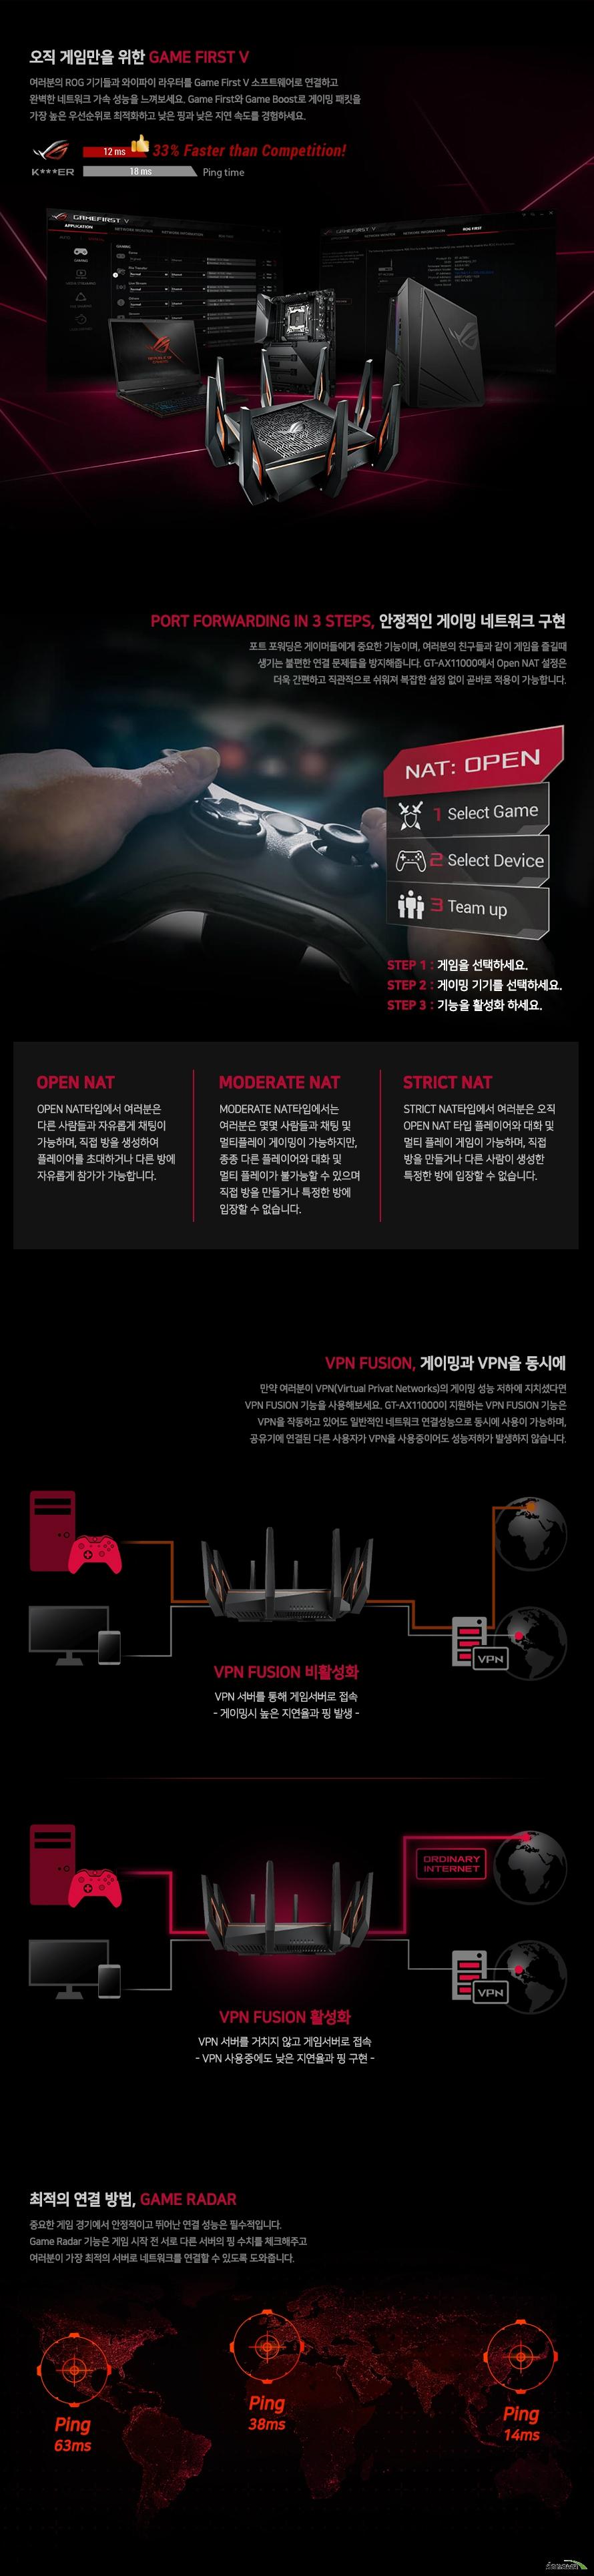 ASUS ROG Rapture GT-AX11000 유무선공유기